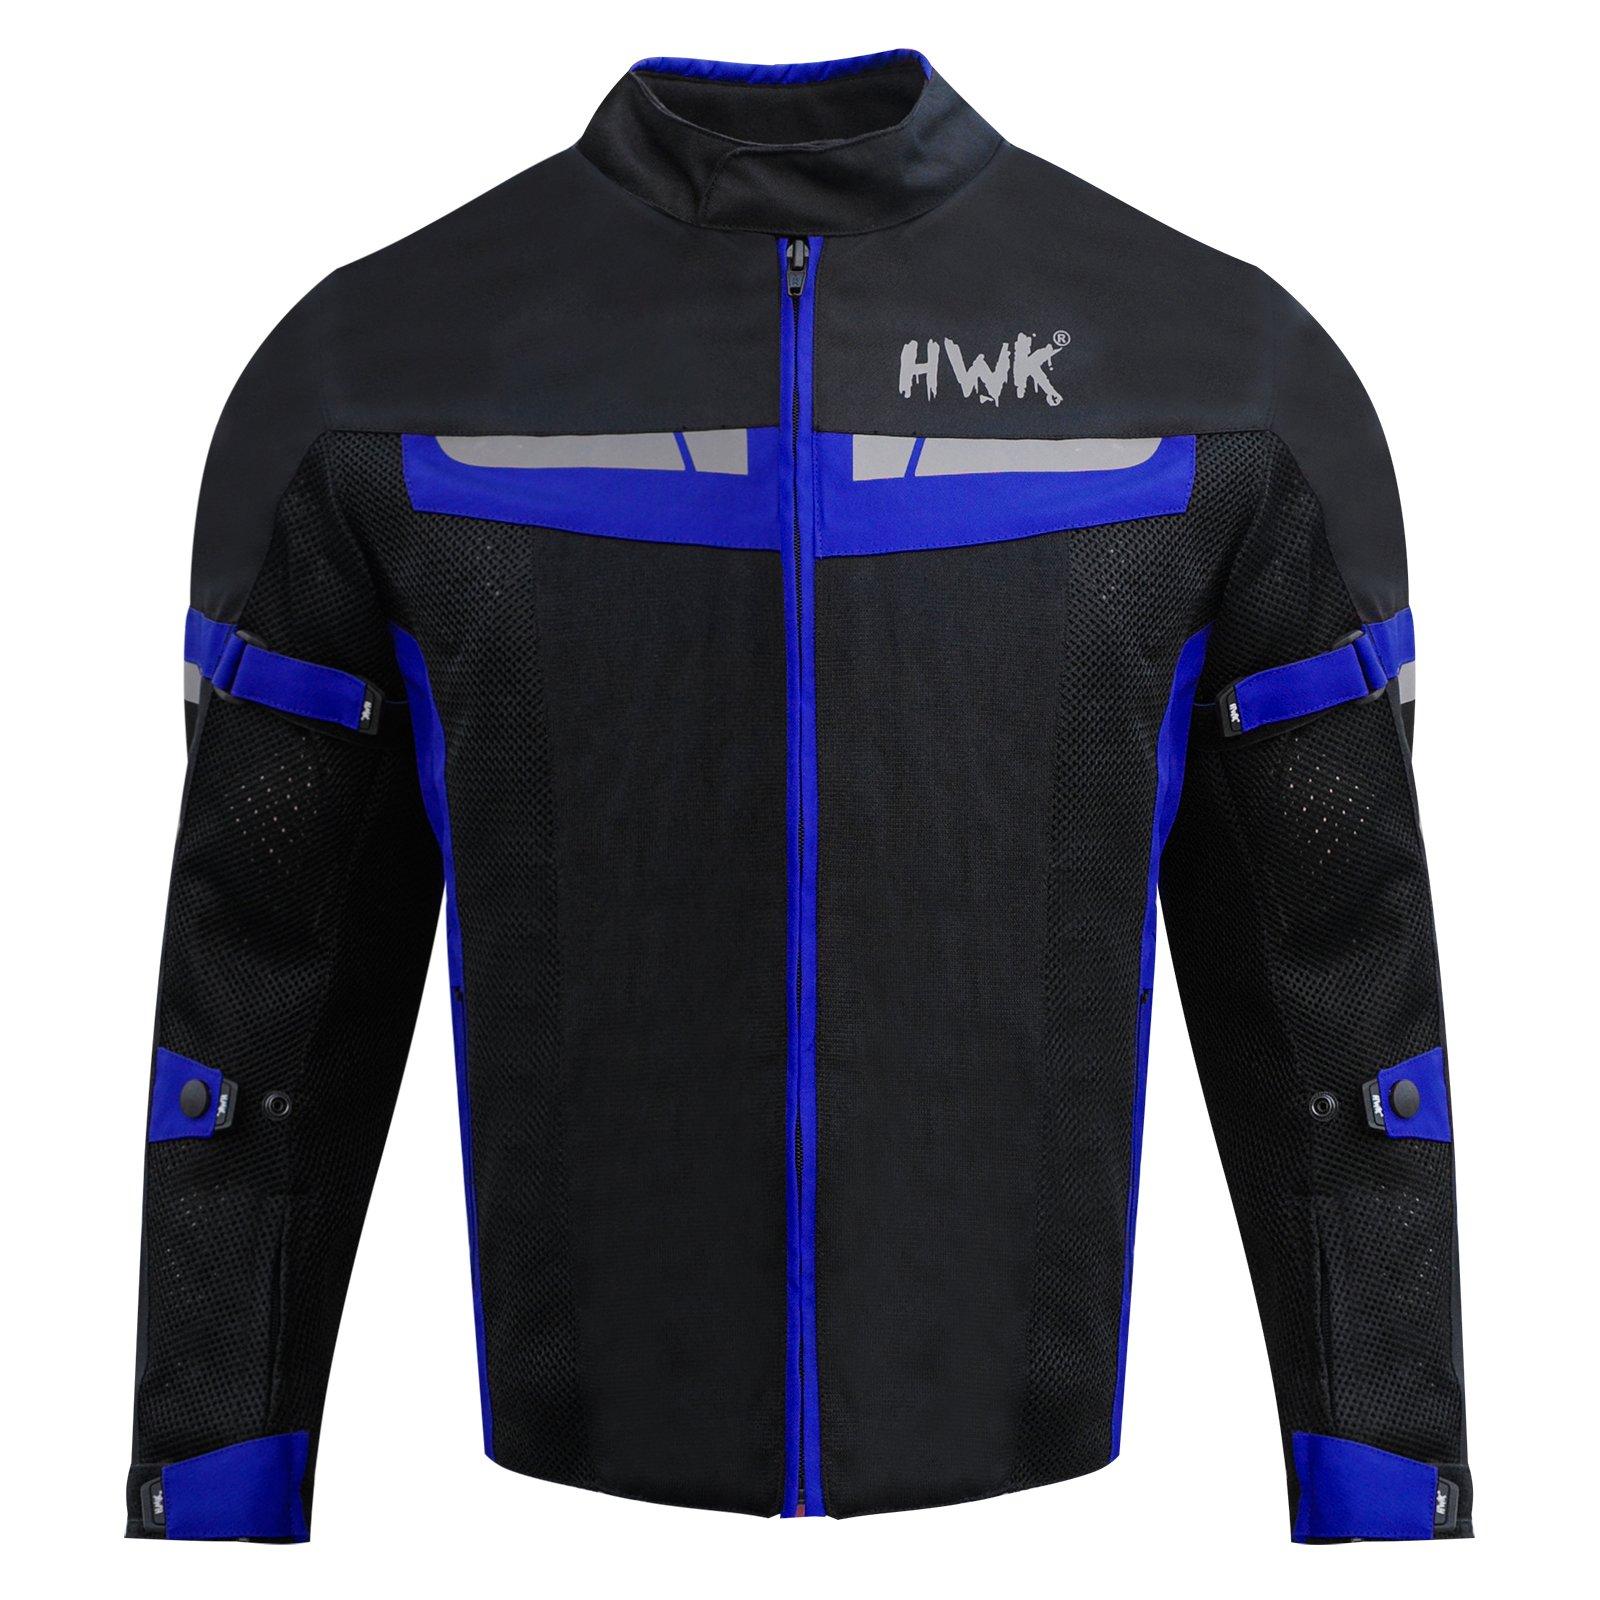 HWK Motorsports Direct Mesh Motorcycle Jacket Coat Motorbike Jacket Biker Cordura Waterproof CE Armoured Breathable 100% Waterproof Reissa Membrane 1 YEAR WARRANTY!! (X-Large, Blue)